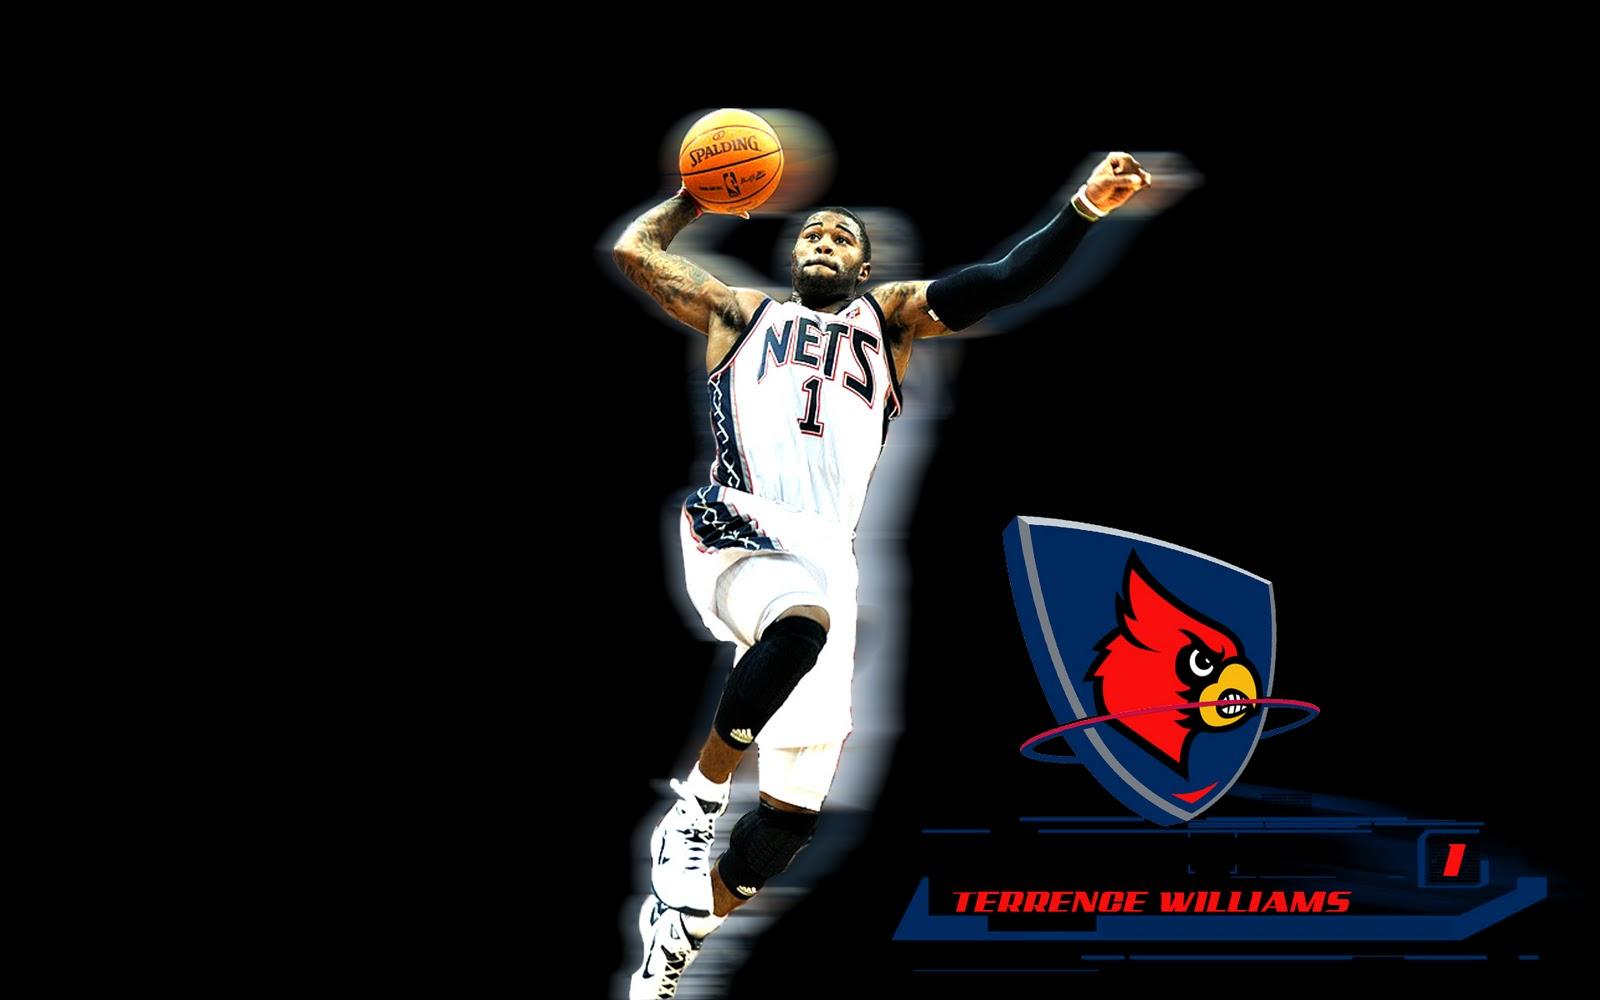 http://3.bp.blogspot.com/-1QYKJInhFJI/Tx03_jlia_I/AAAAAAAAE0E/xE1IpARor4g/s1600/terrencewilliams-basketball-wallpaper.jpg